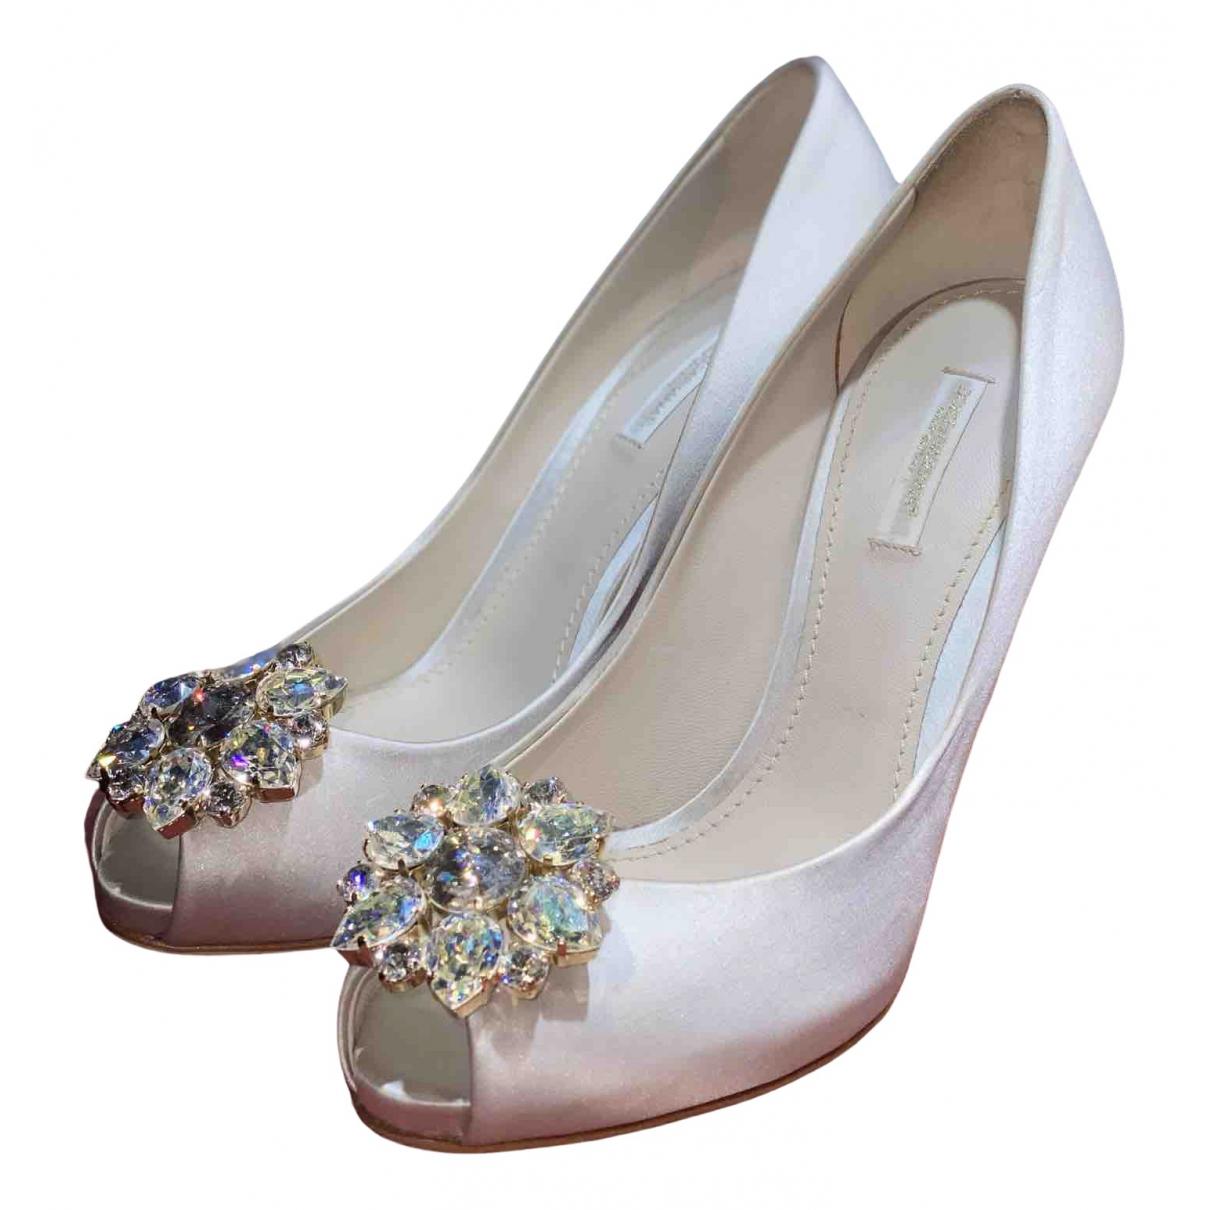 Dolce & Gabbana N Grey Cloth Sandals for Women 38 EU